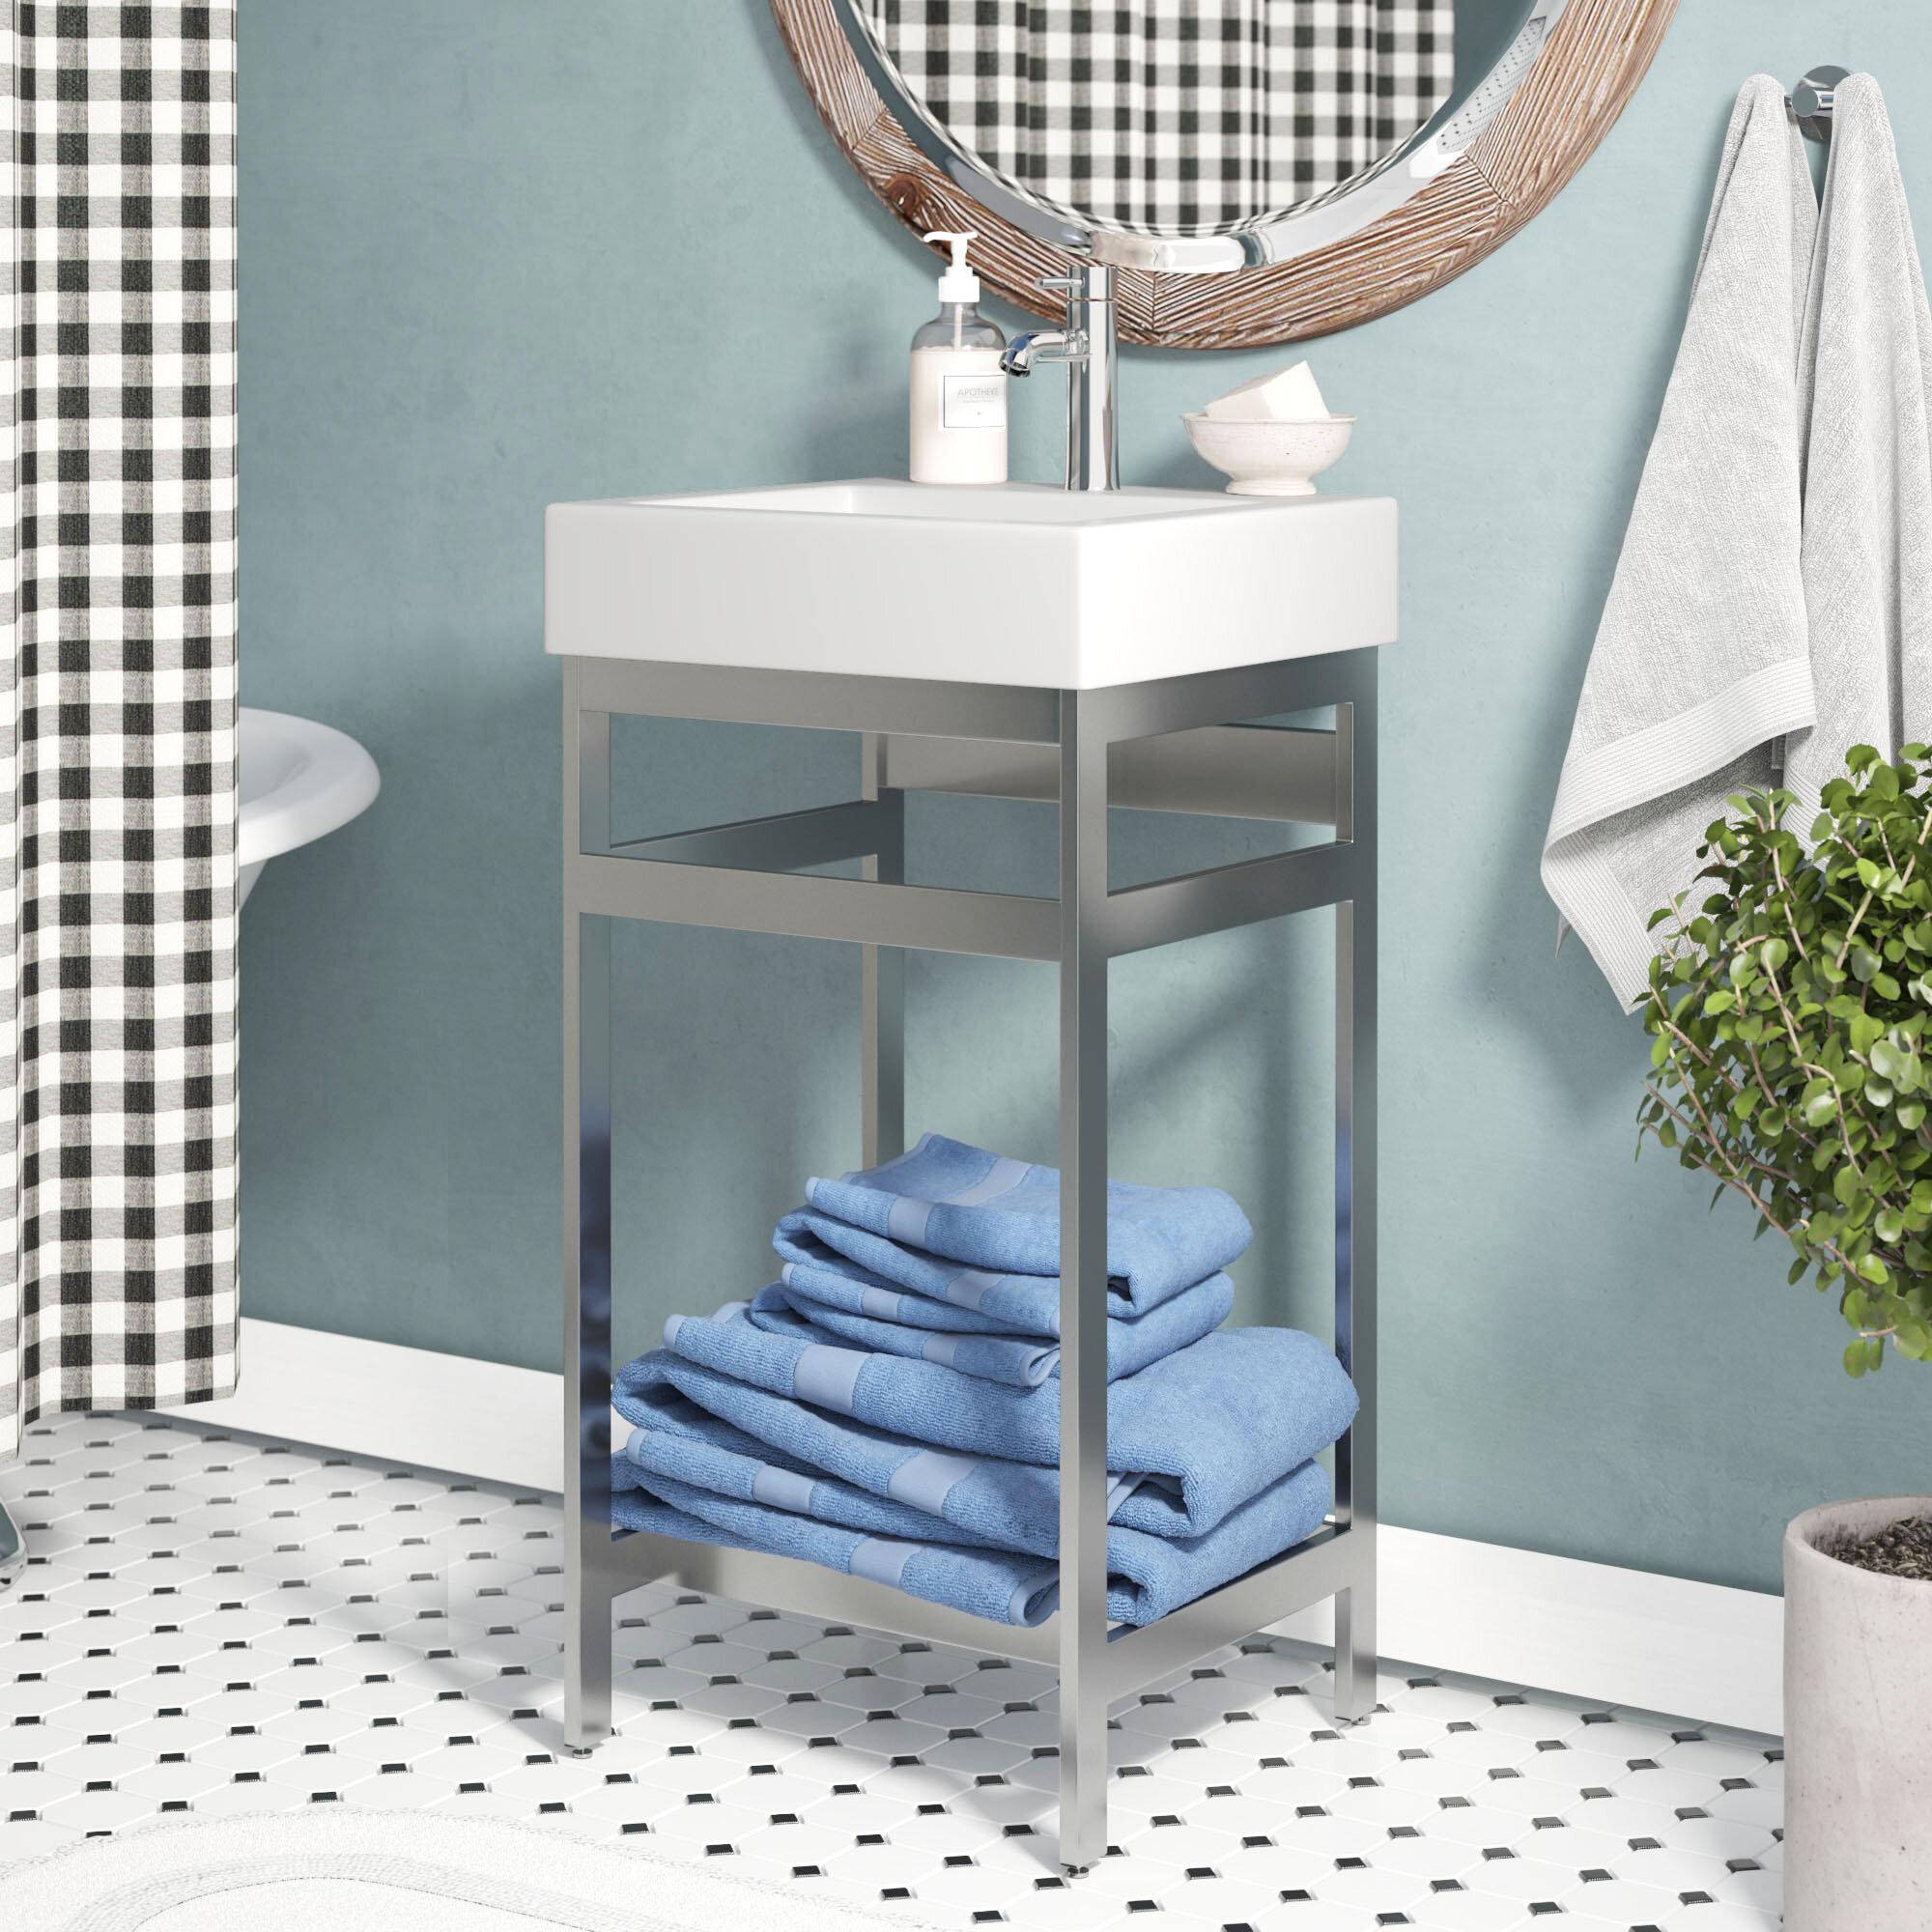 Ivy Bronx Arverne Stainless Steel Open Console 18 Single Bathroom Vanity Set Reviews Wayfair